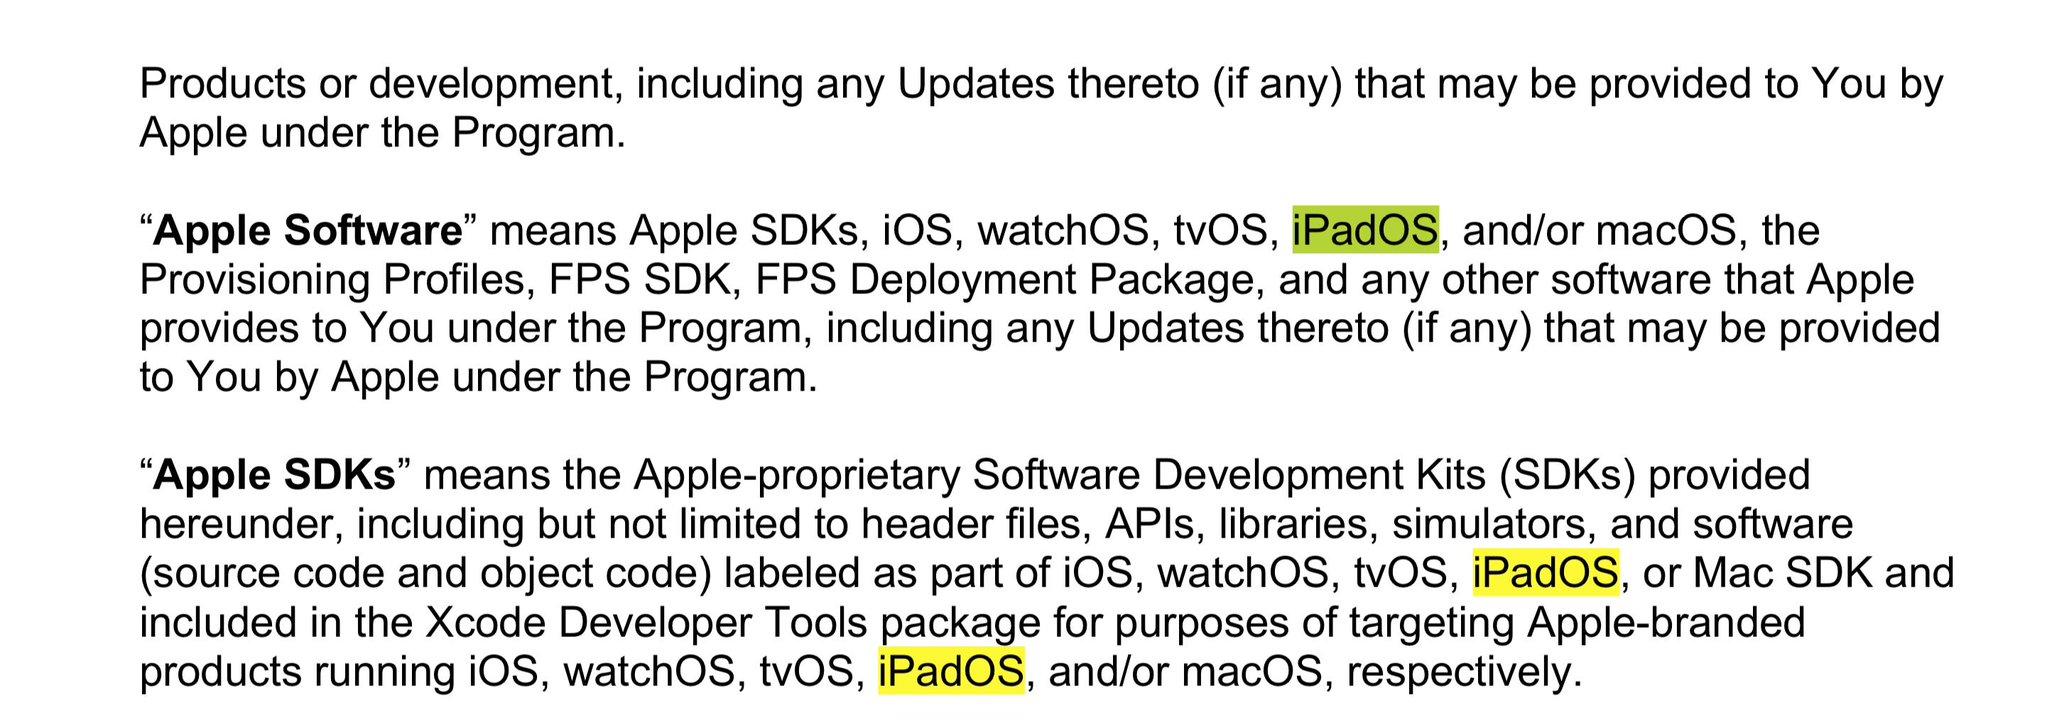 iPadOS apple